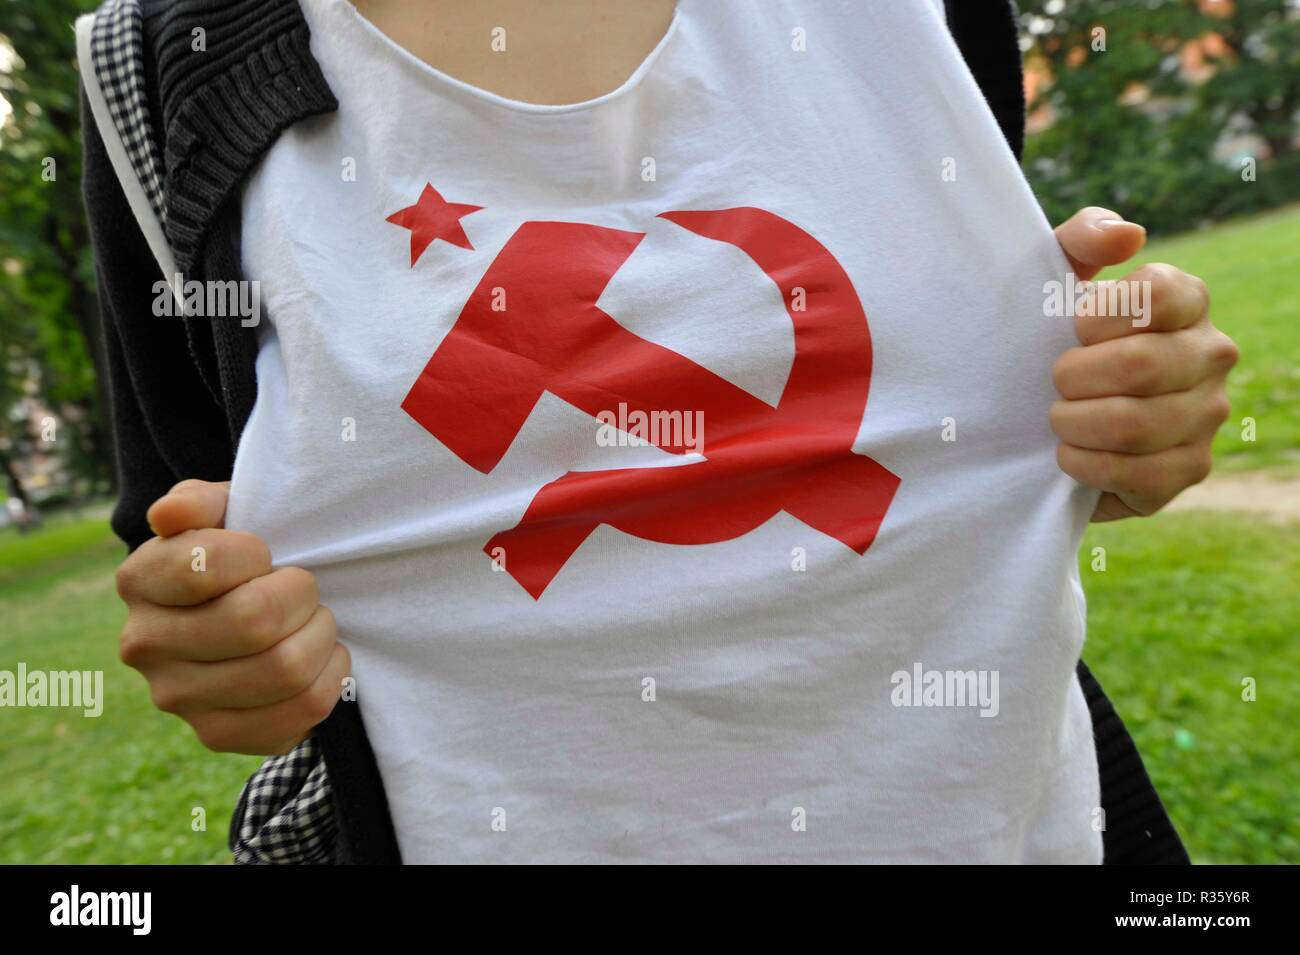 hammer and sickle,hammer-sickle,hammer,sickle,communism,democracy,state - Stock Image